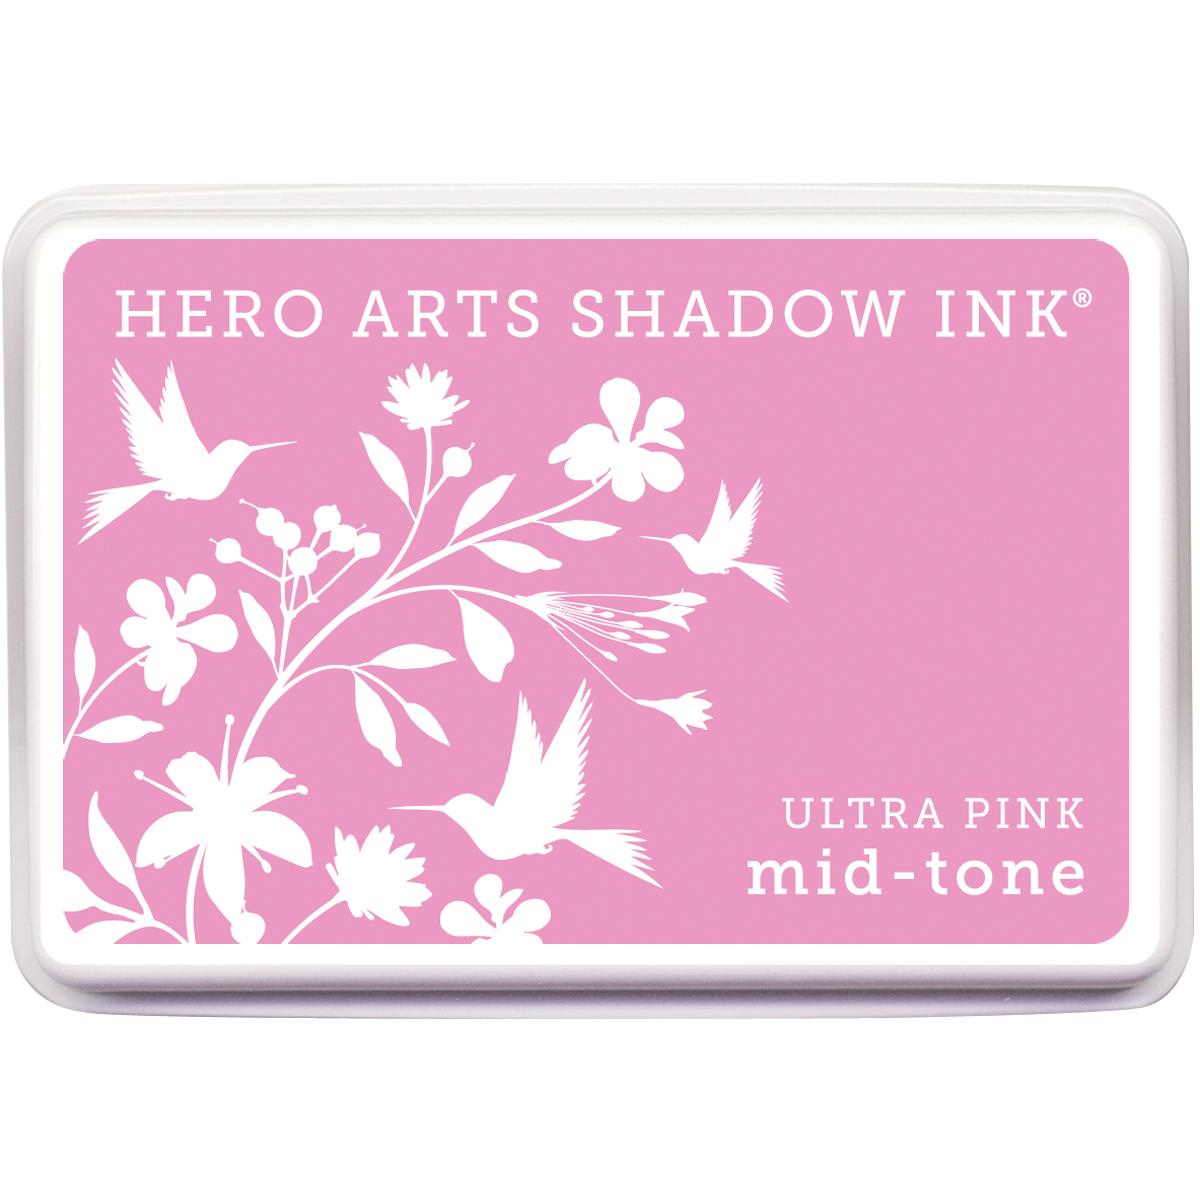 Hero Arts Midtone Shadow Ink Pad-Ultra Pink